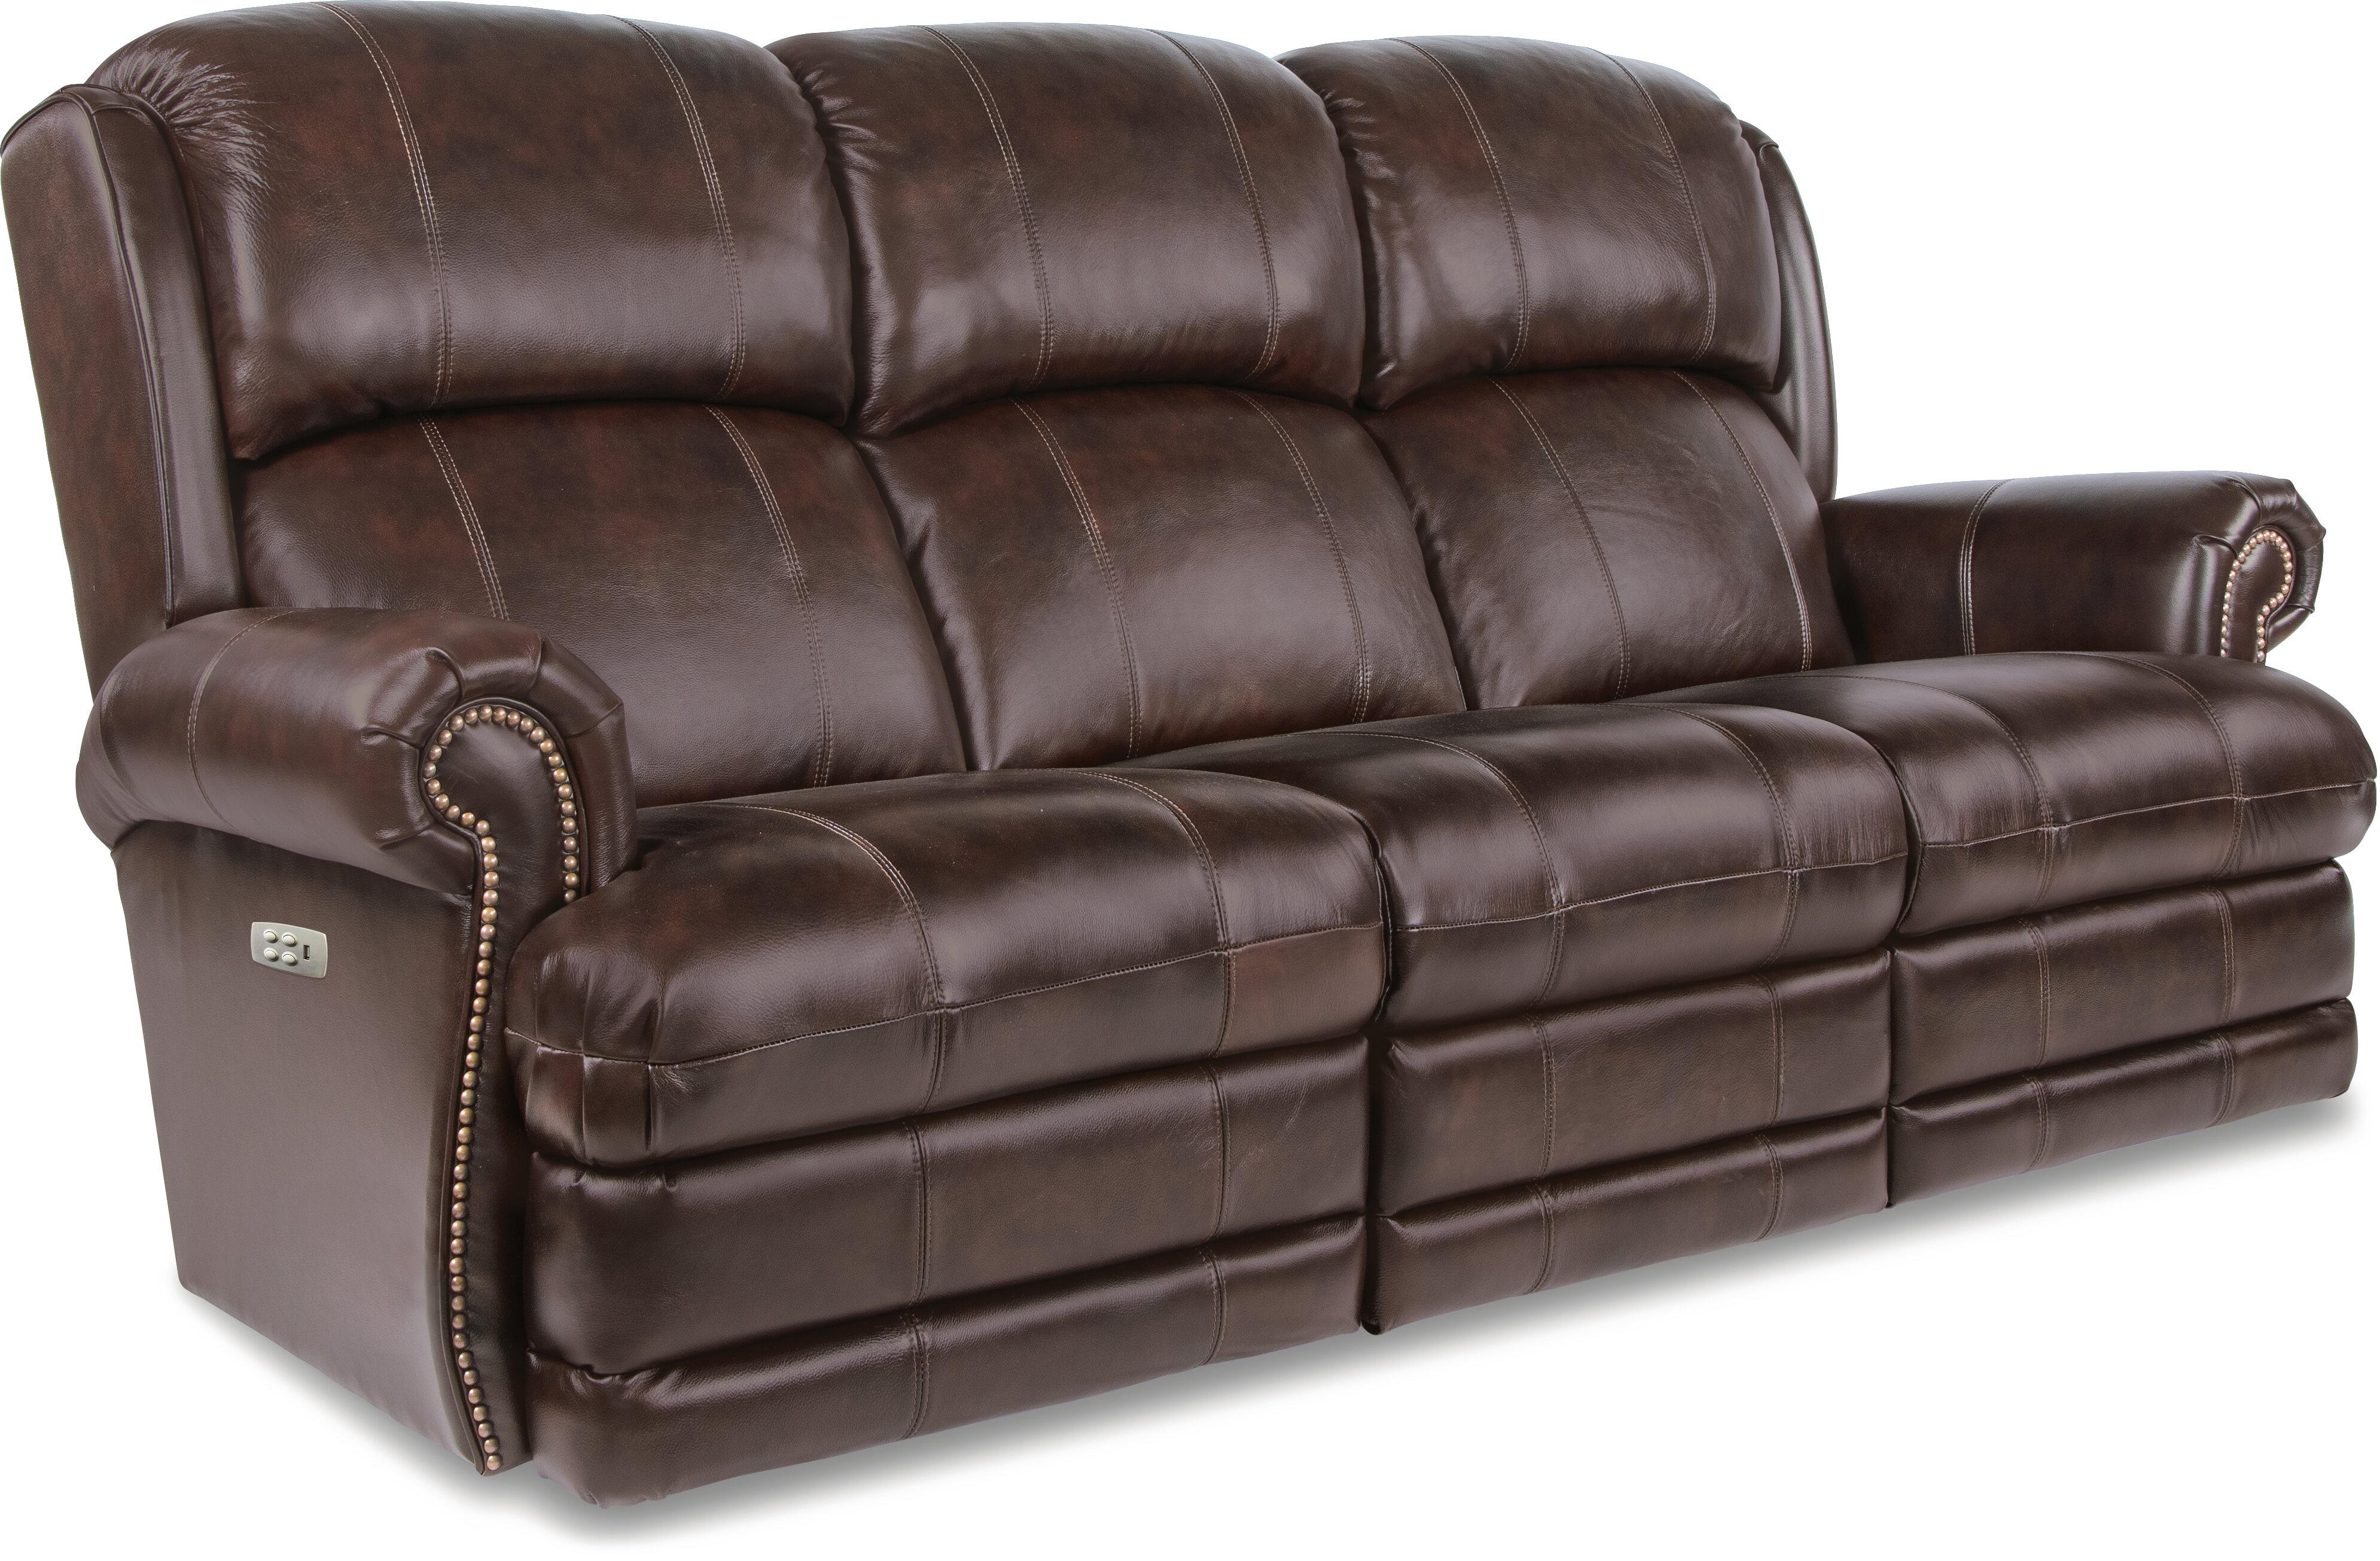 Zero Wall Recliner Sofa Wayfair